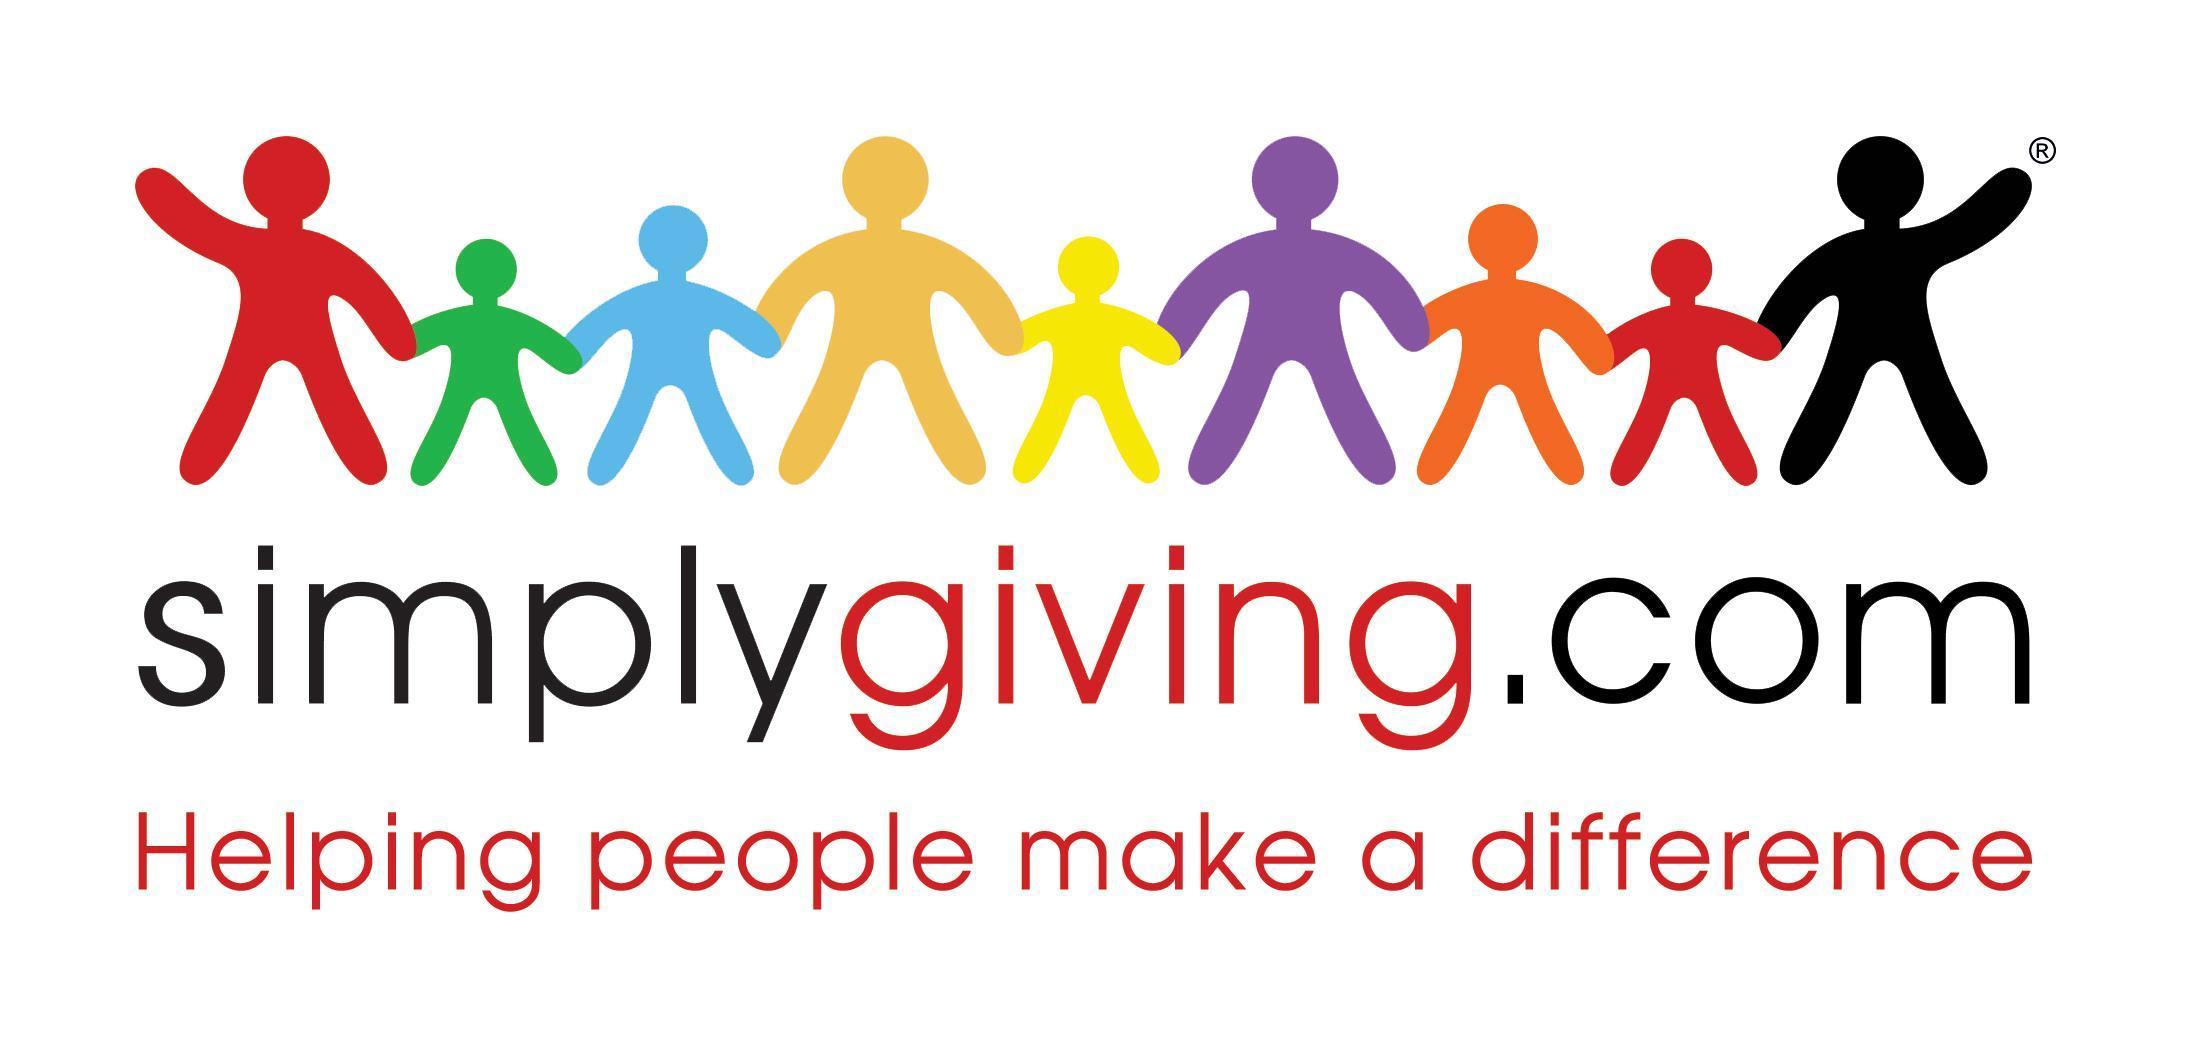 SimplyGiving company logo